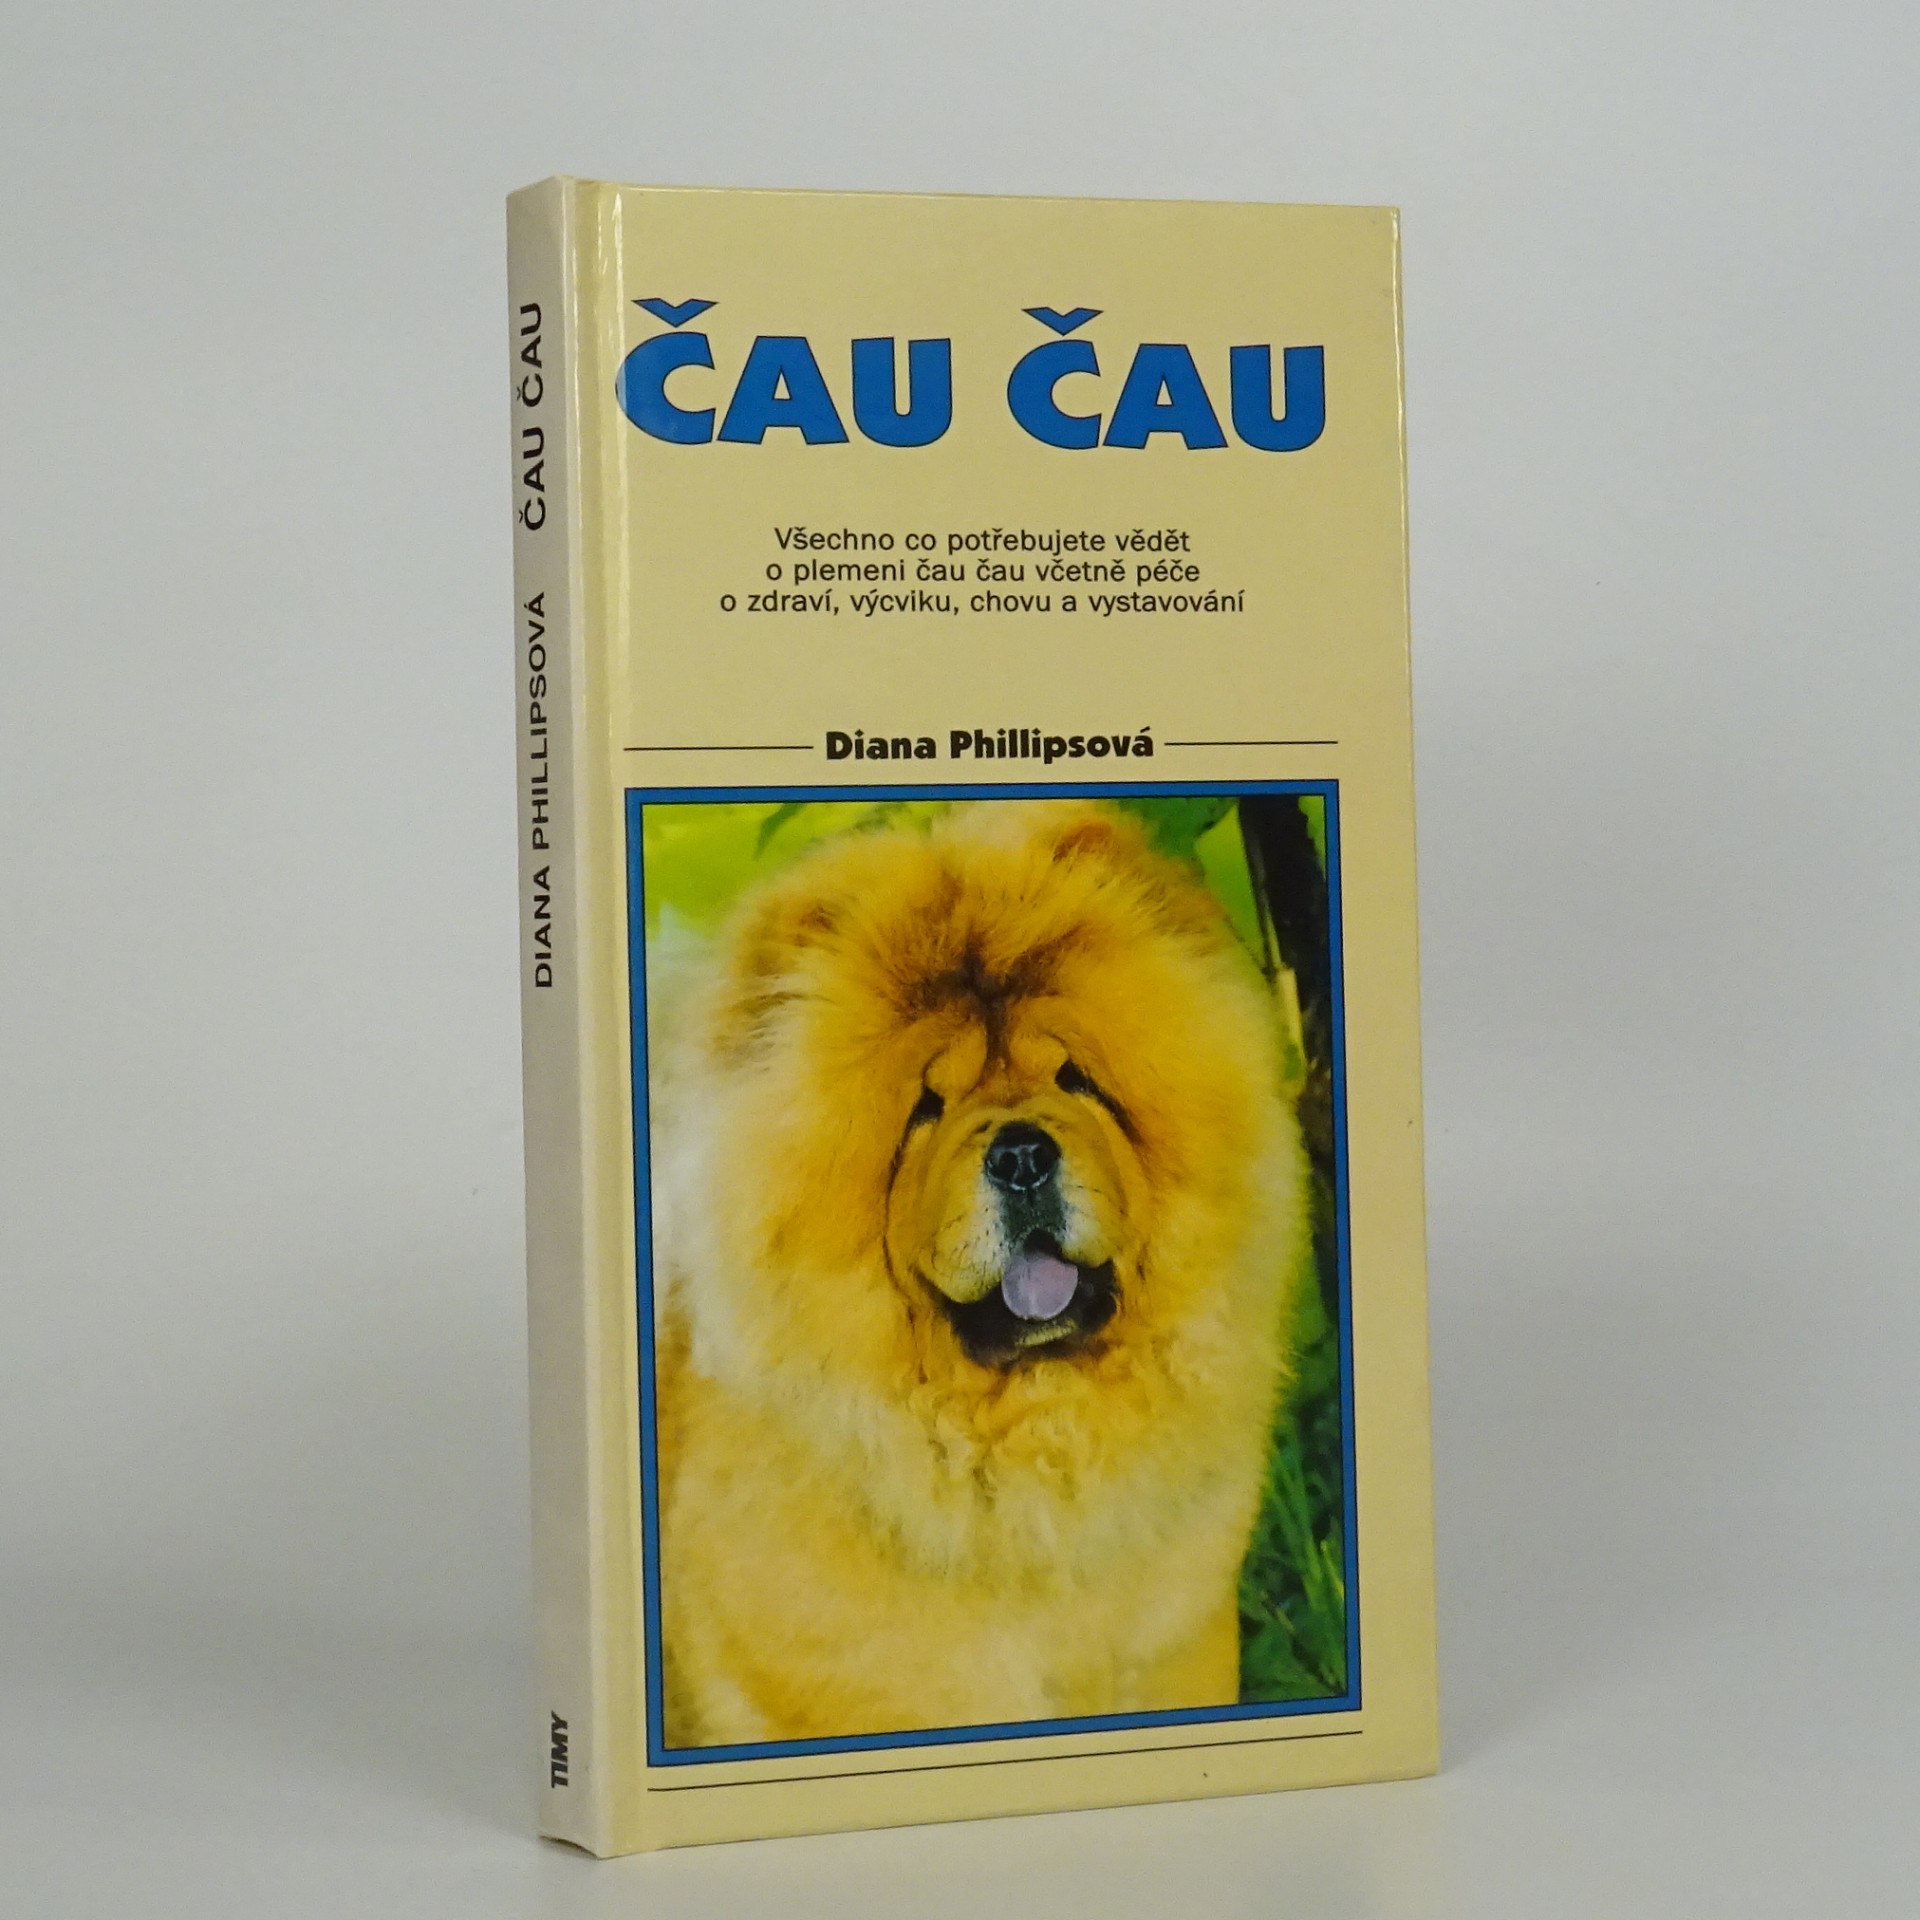 antikvární kniha Čau čau, 1999